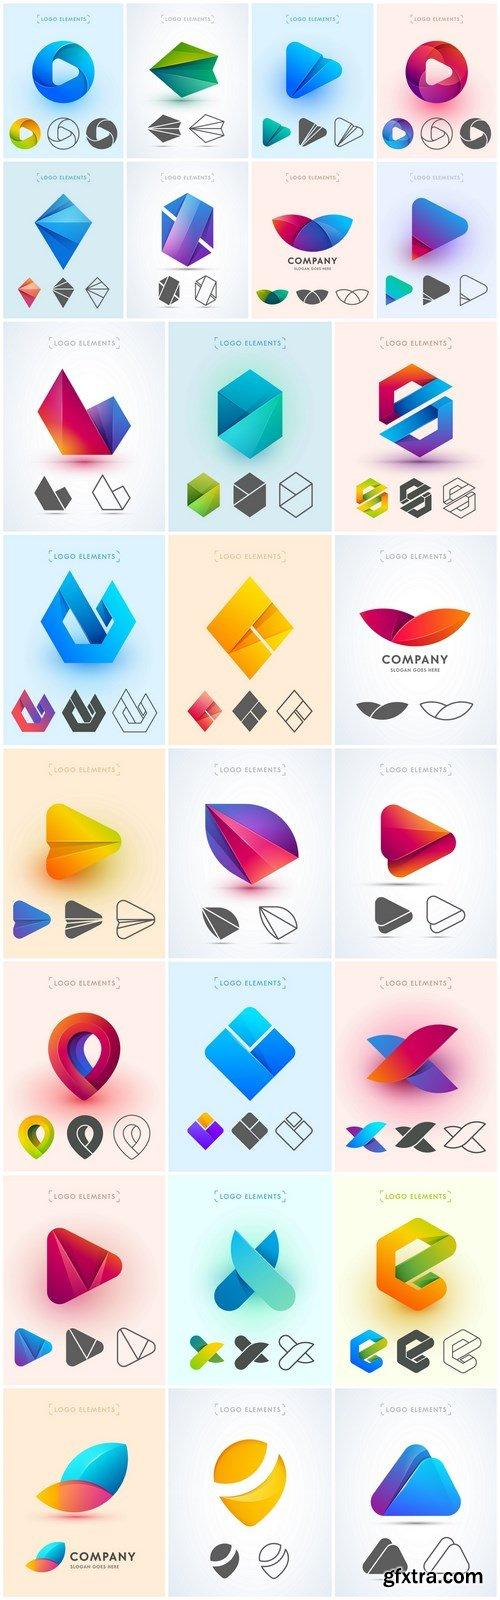 Logo Design Elements - 26 Vector